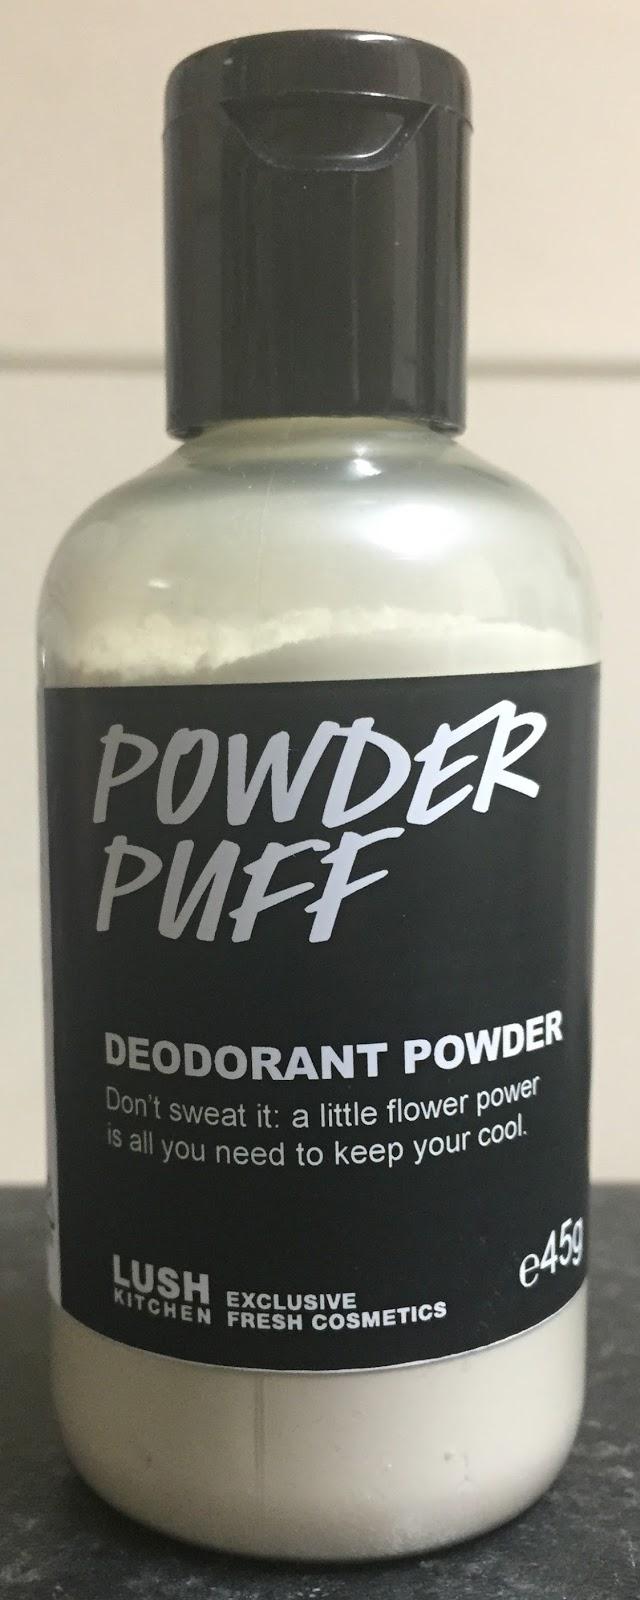 All Things Lush Uk Powder Puff Deodorant Powder